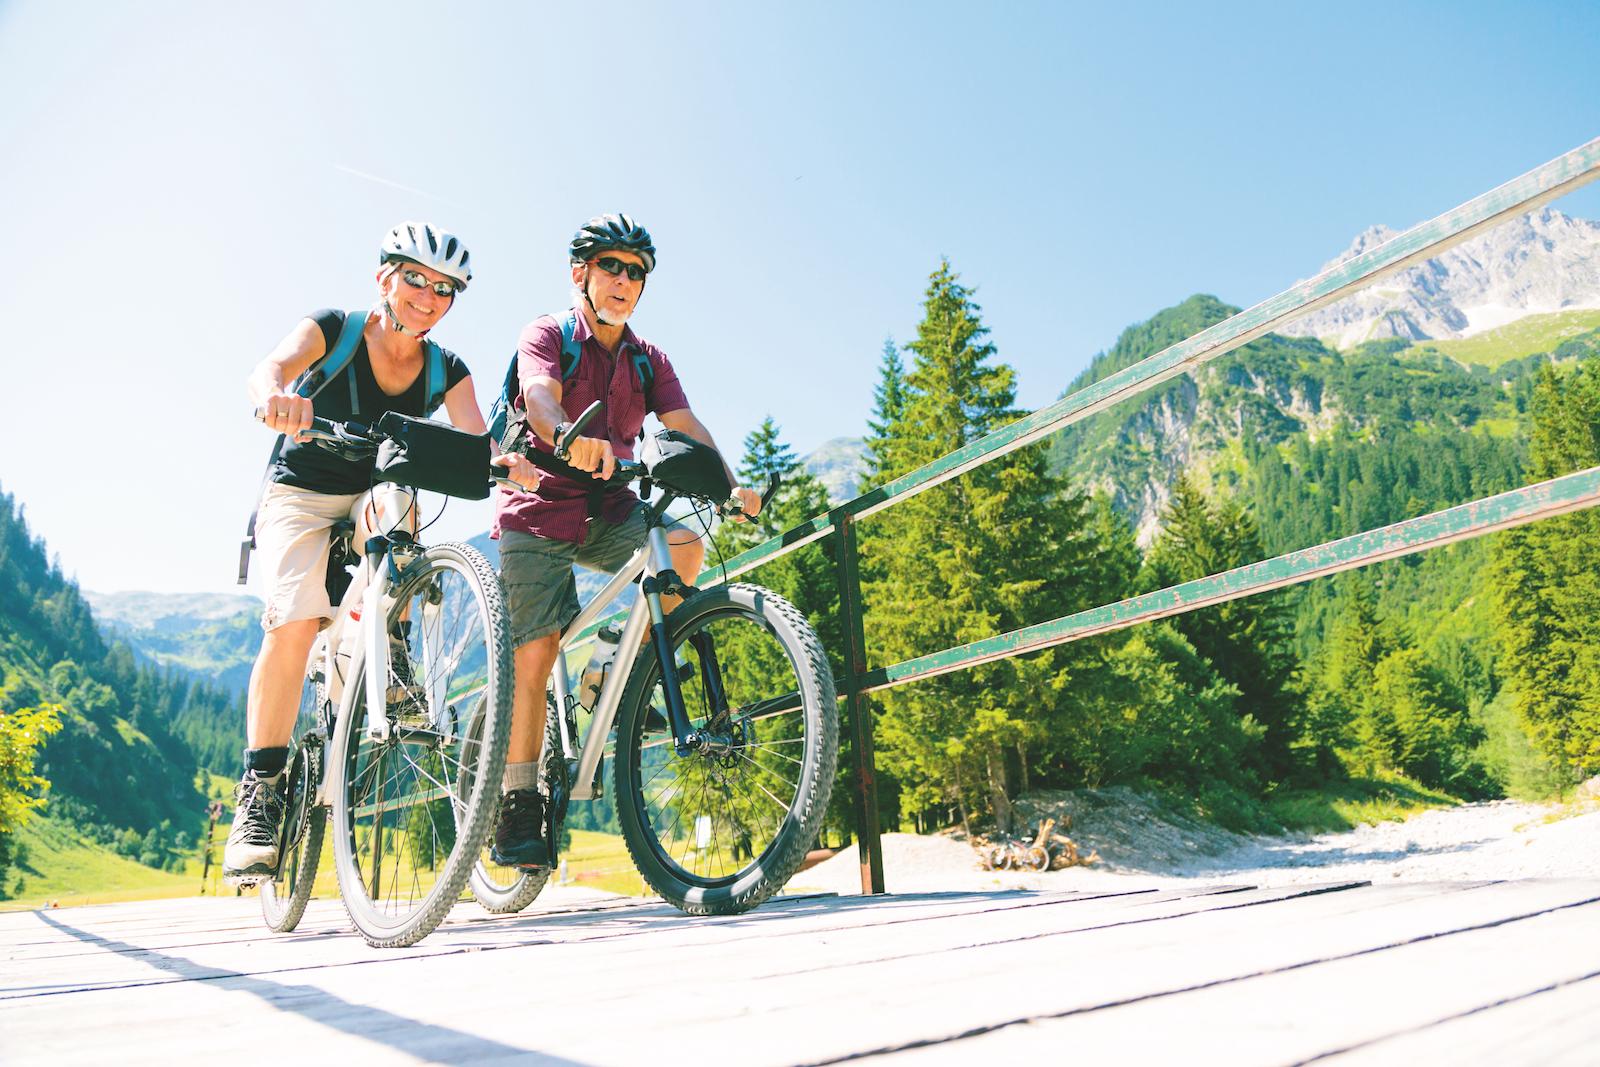 santé vieillir vélo